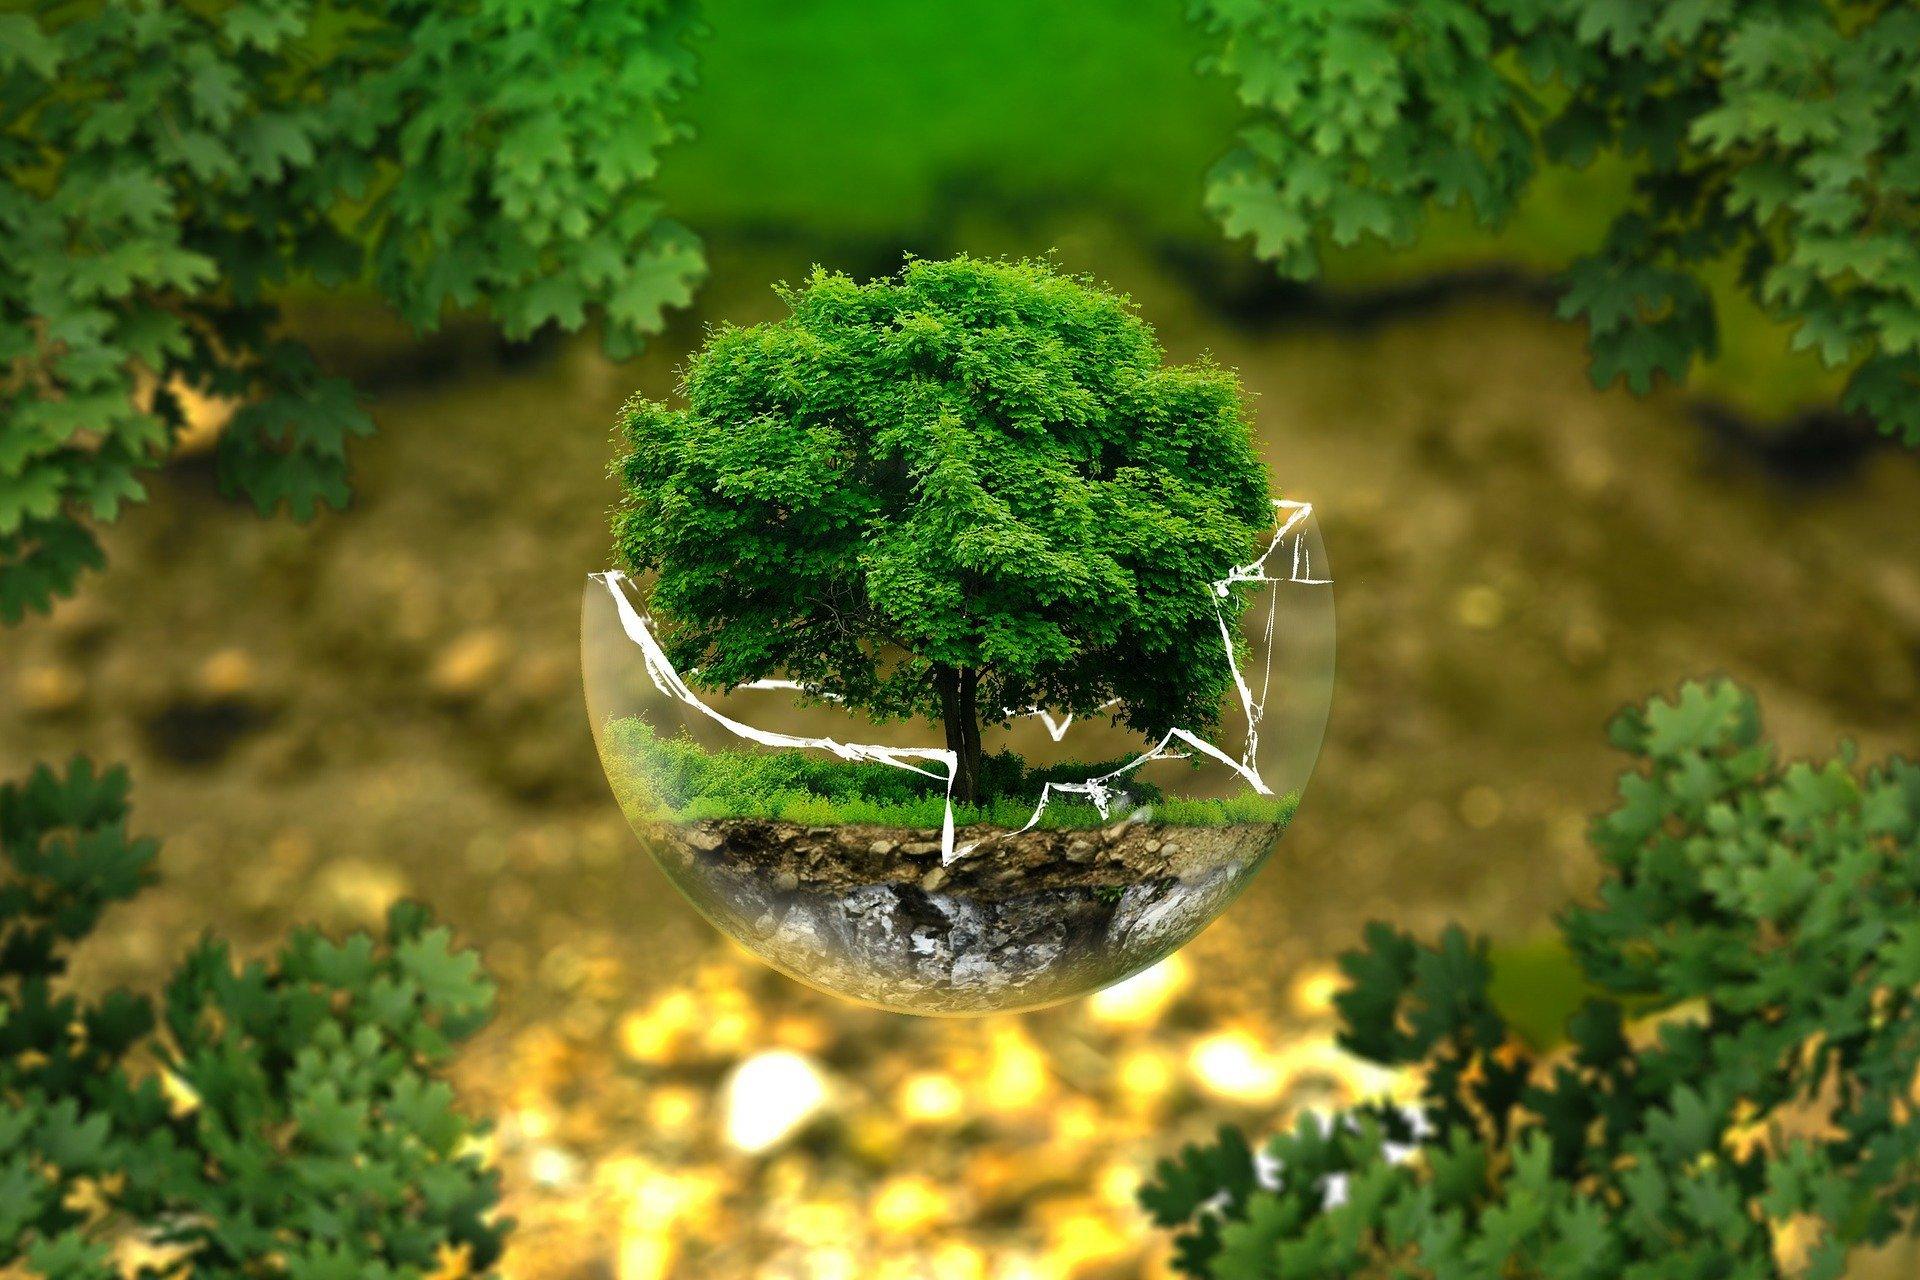 Webinar 6 luglio 2020 ore 9,15  - AZIENDA GREEN environmental-protection-326923_1920_5546_1.jpg (Art. corrente, Pag. 1, Foto logo)